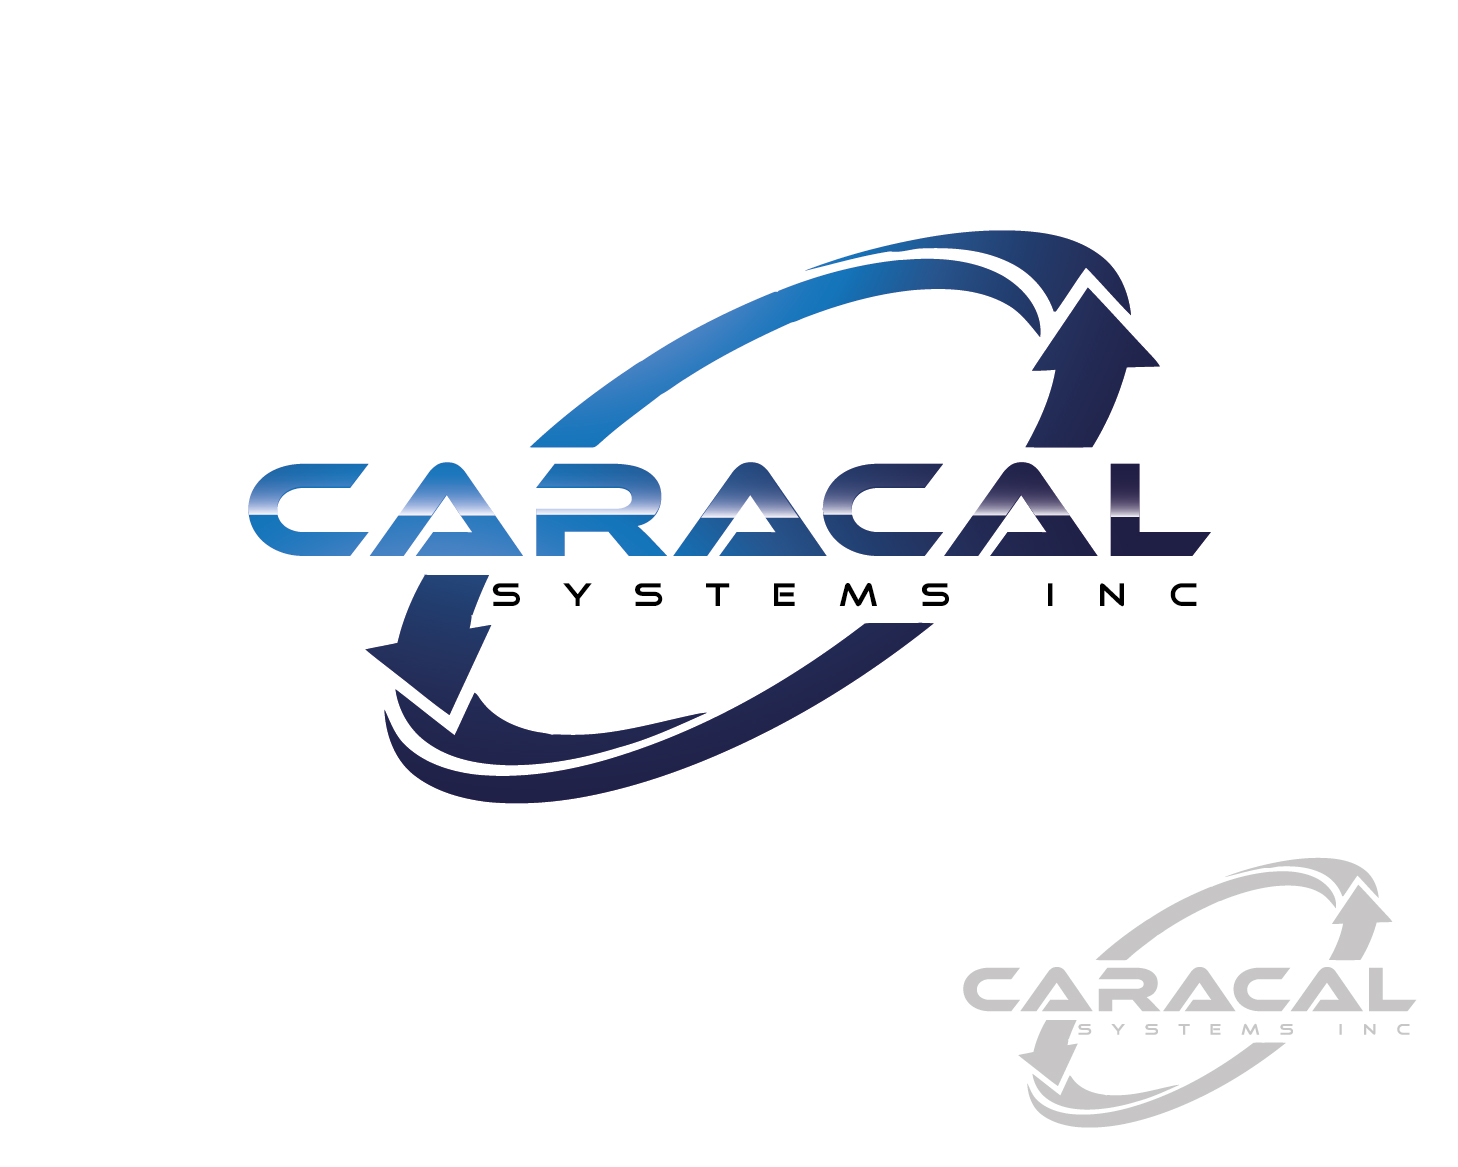 Logo Design by VENTSISLAV KOVACHEV - Entry No. 8 in the Logo Design Contest Inspiring Logo Design for Caracal Systems Inc..